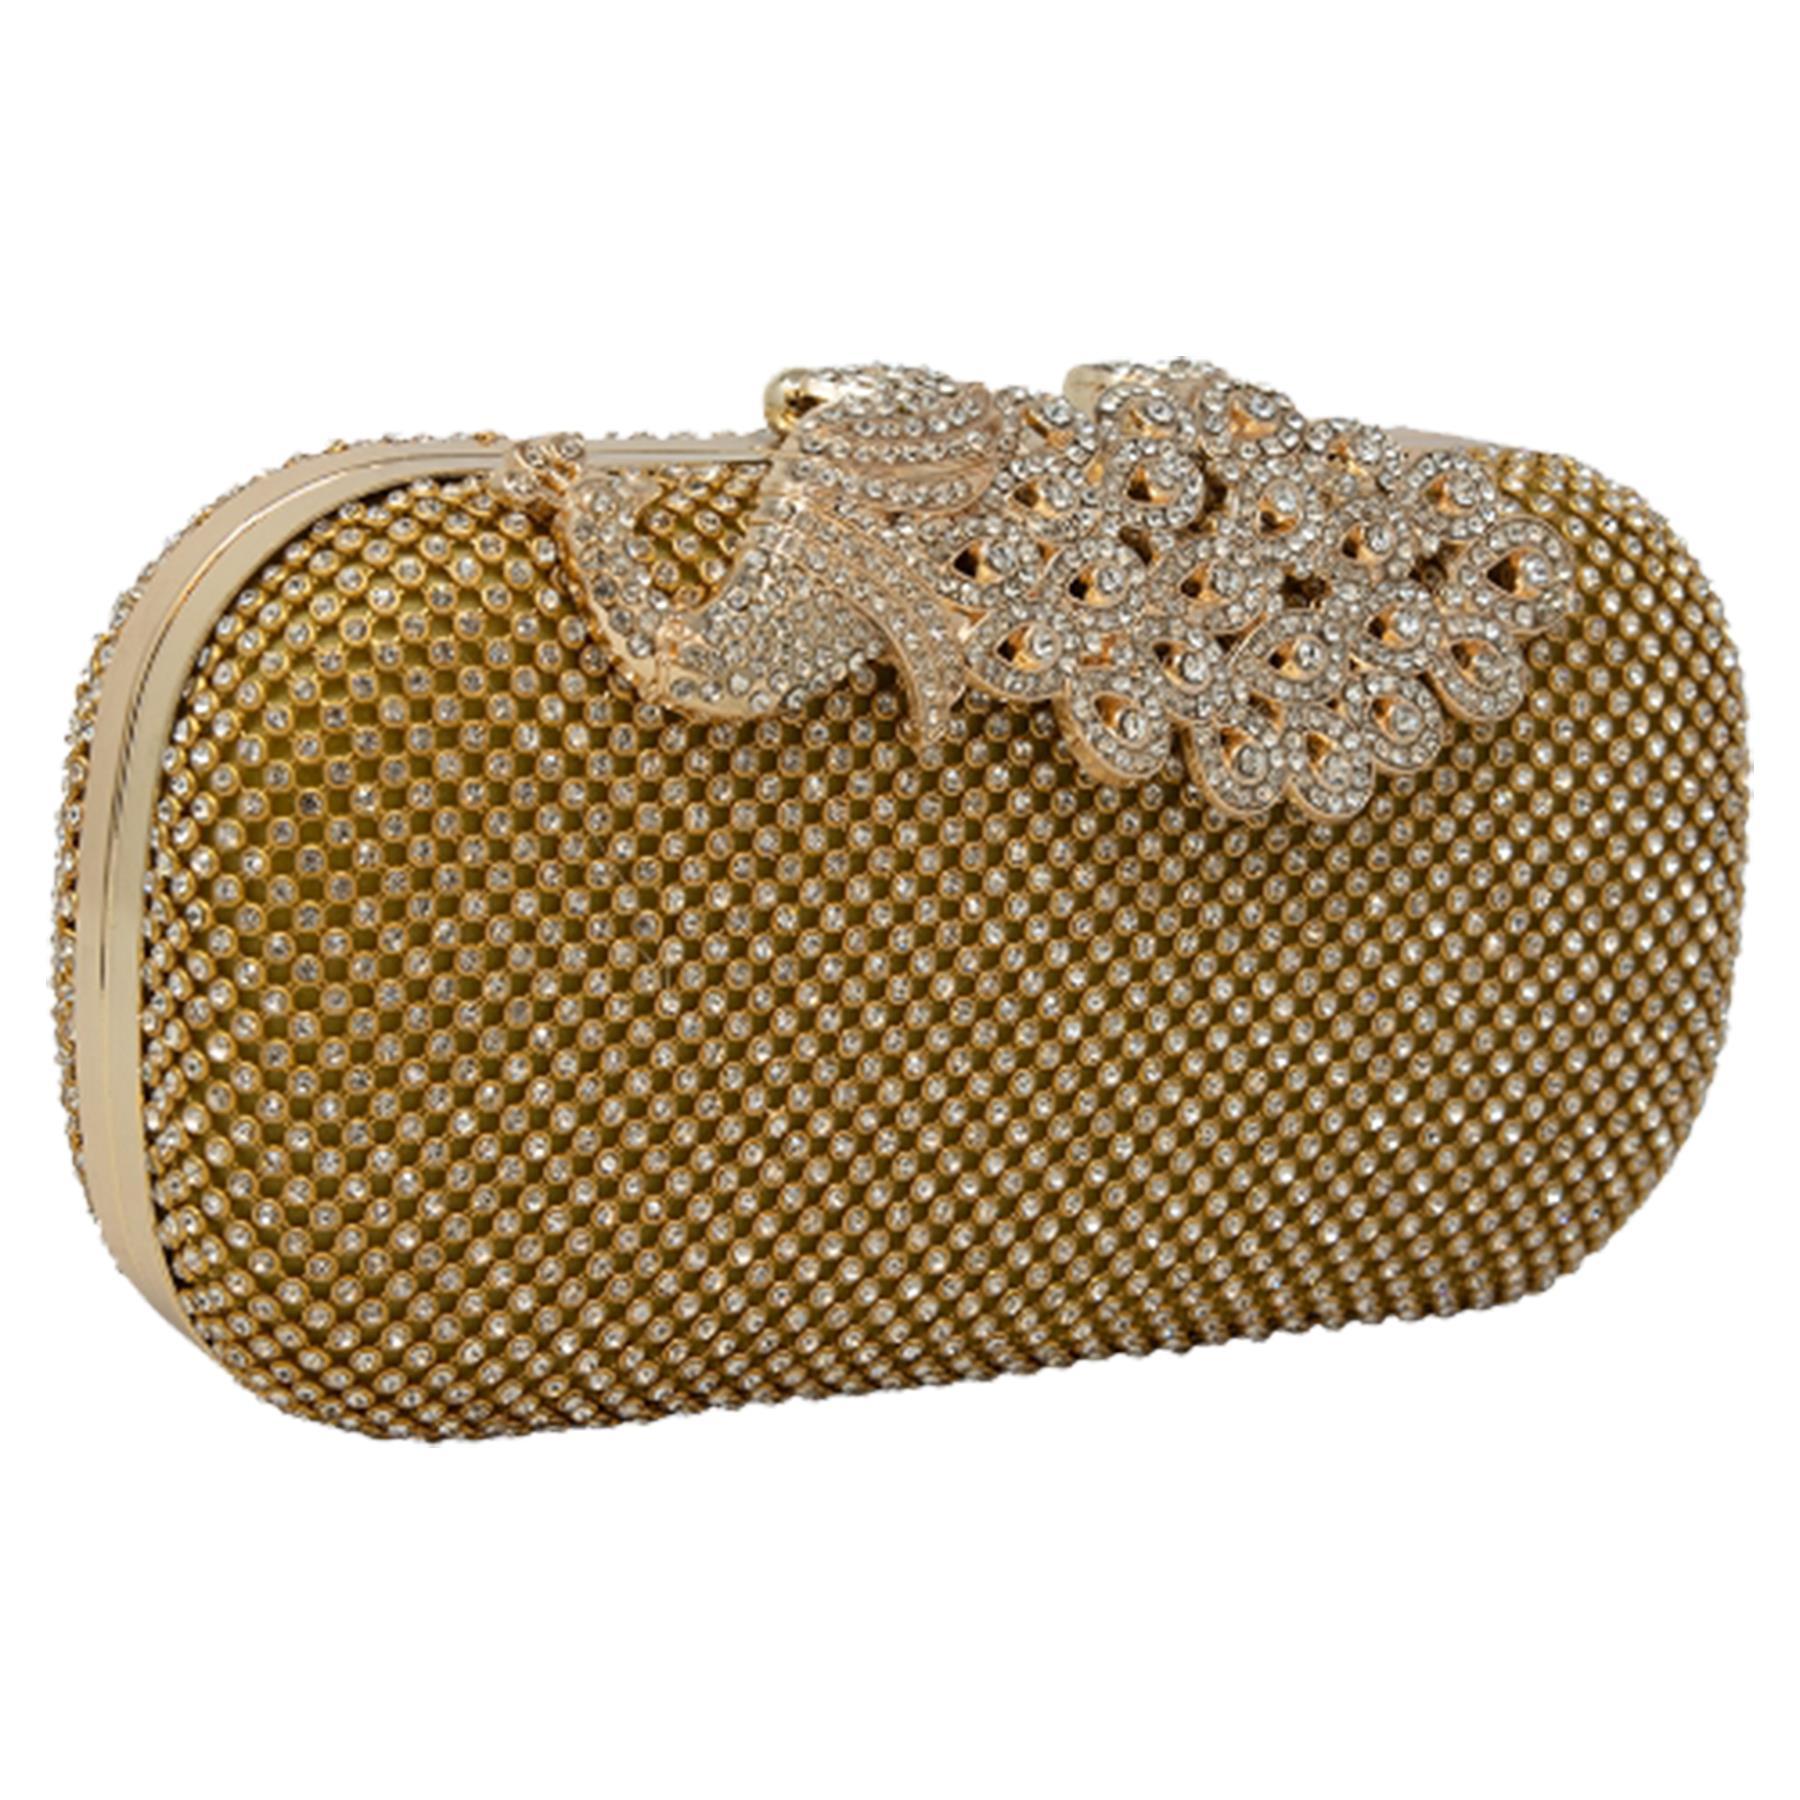 New-Women-s-Jewel-Elephant-Detail-Diamante-Chain-Box-Clutch-Bag-Purse thumbnail 8